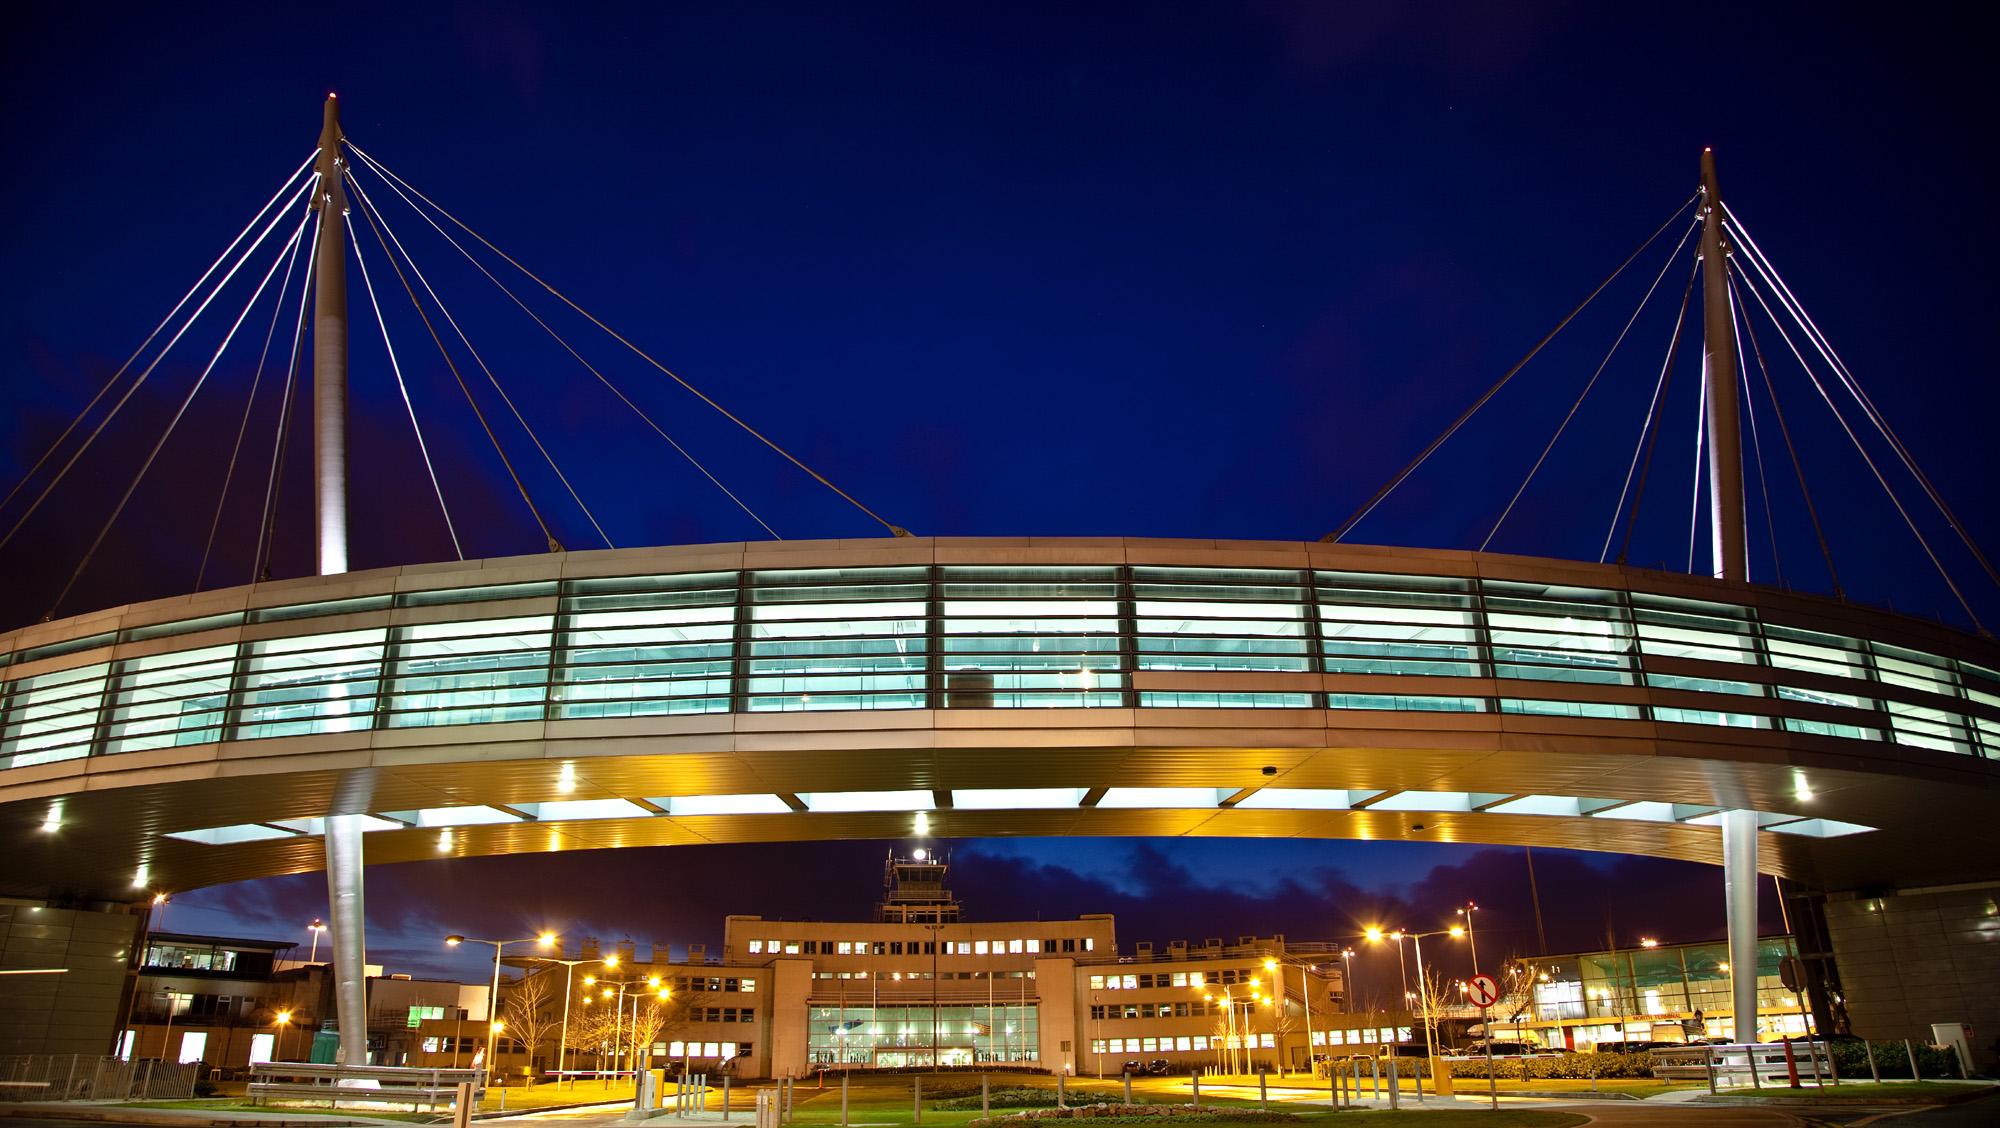 Dublin Airport - Skybridge at night.jpg